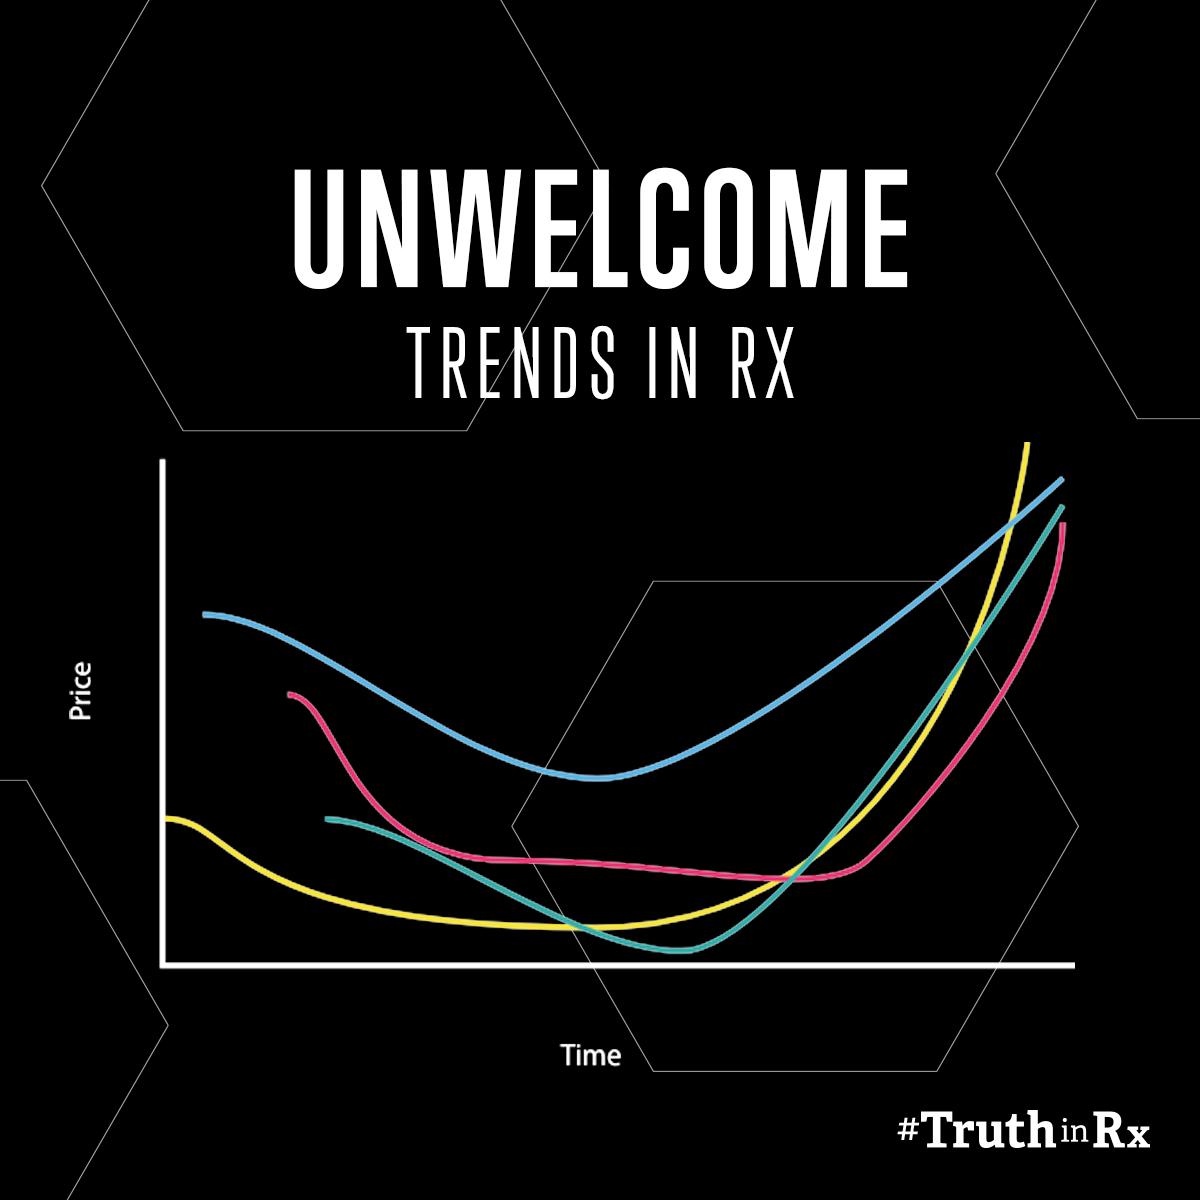 AMA_PAN_TIRX_Unwelcome-Trends_1-1.png